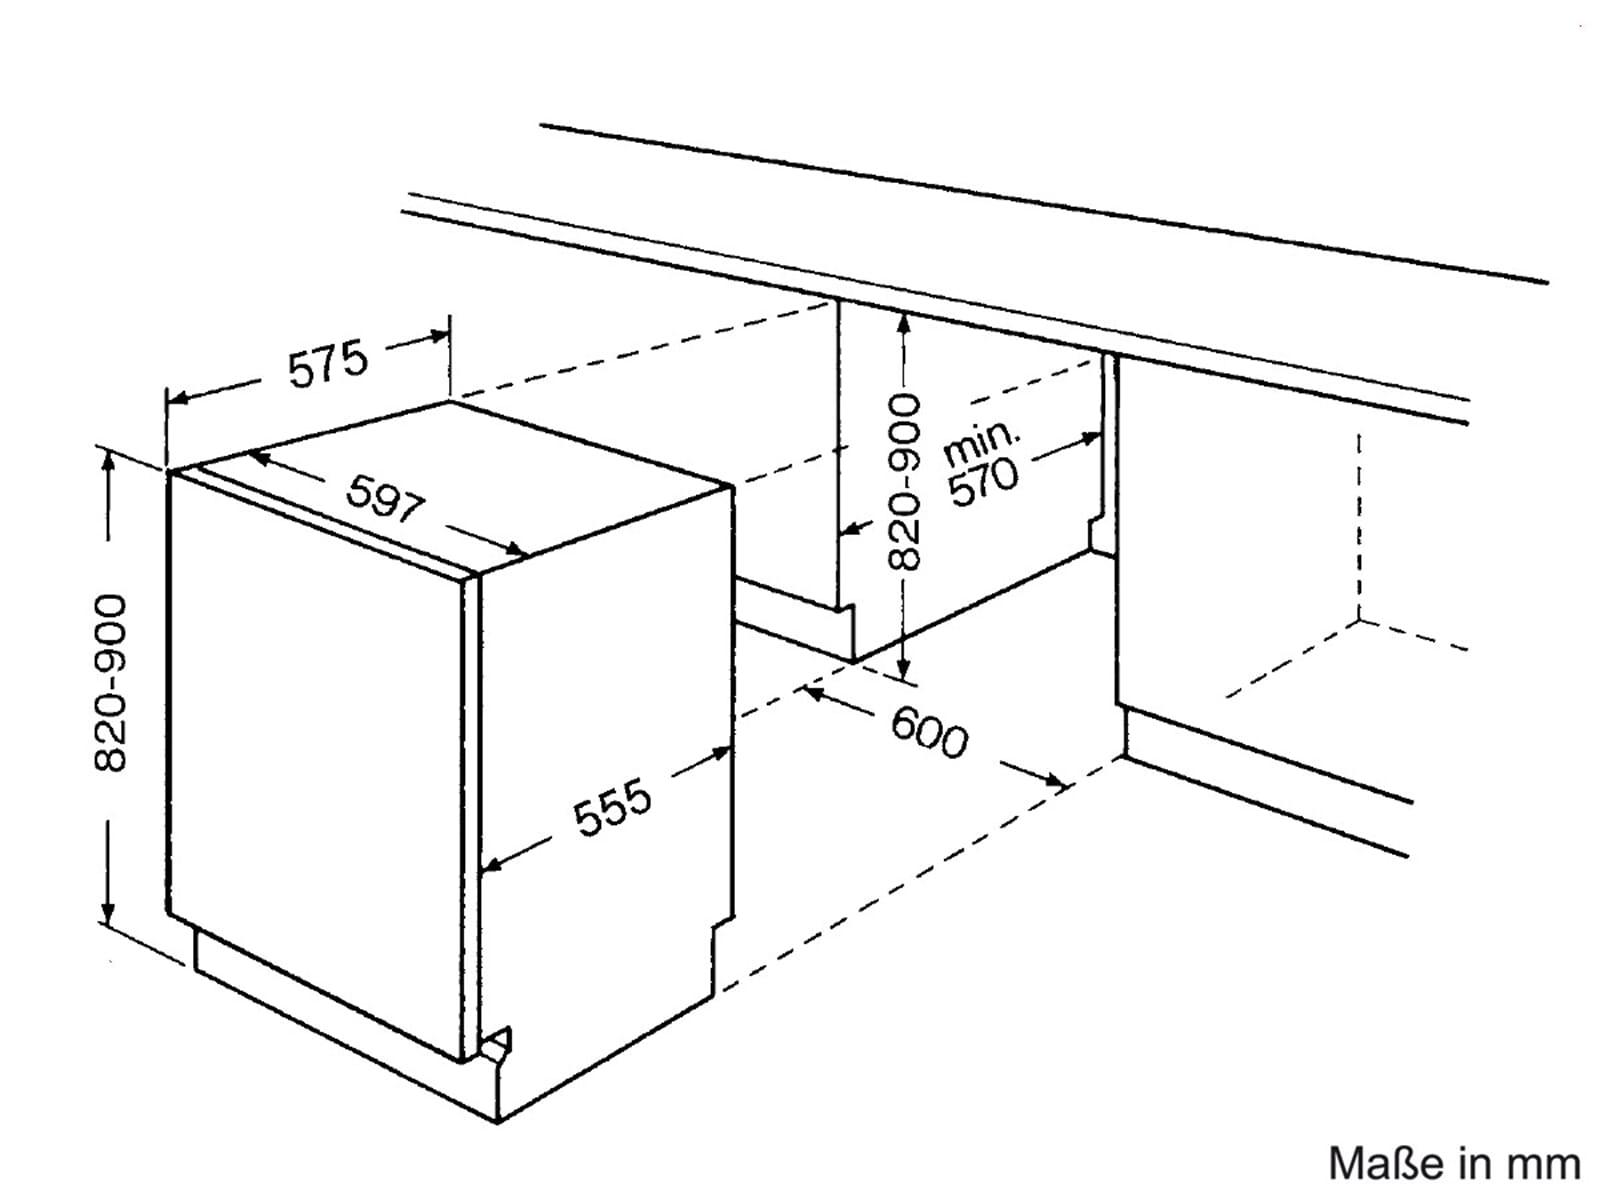 bauknecht gsxs 5104 a1 vollintegrierbar einbau geschirrsp ler sp lmaschine a ebay. Black Bedroom Furniture Sets. Home Design Ideas